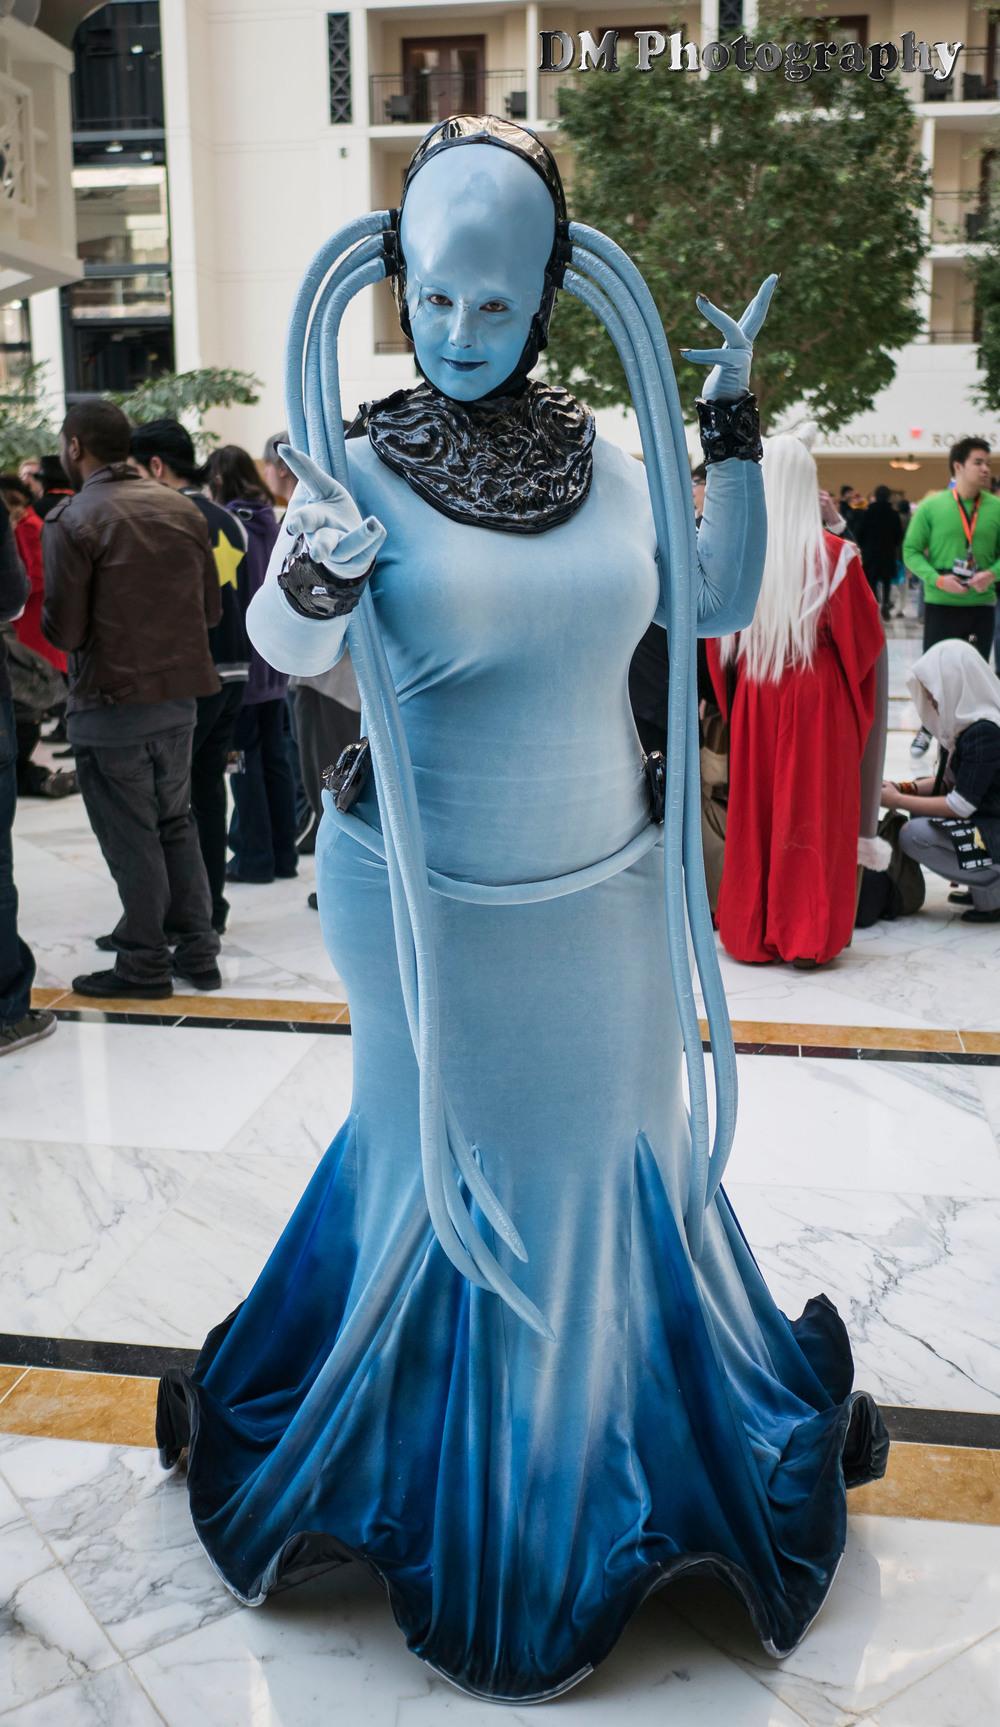 Diva Plavalaguna